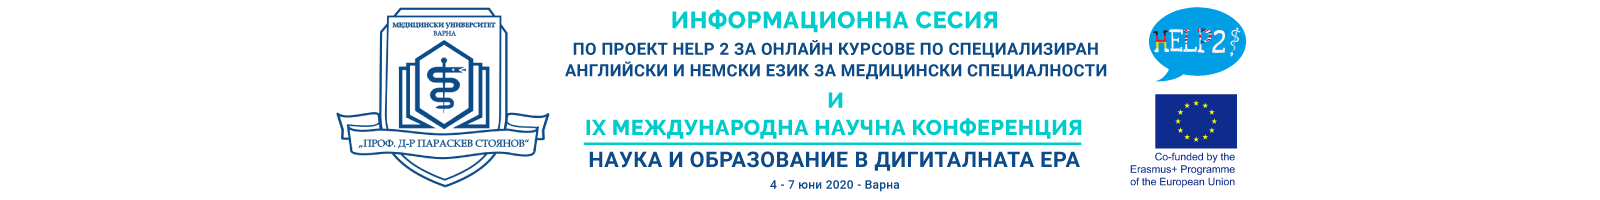 RoundTable - Medical University - Varna